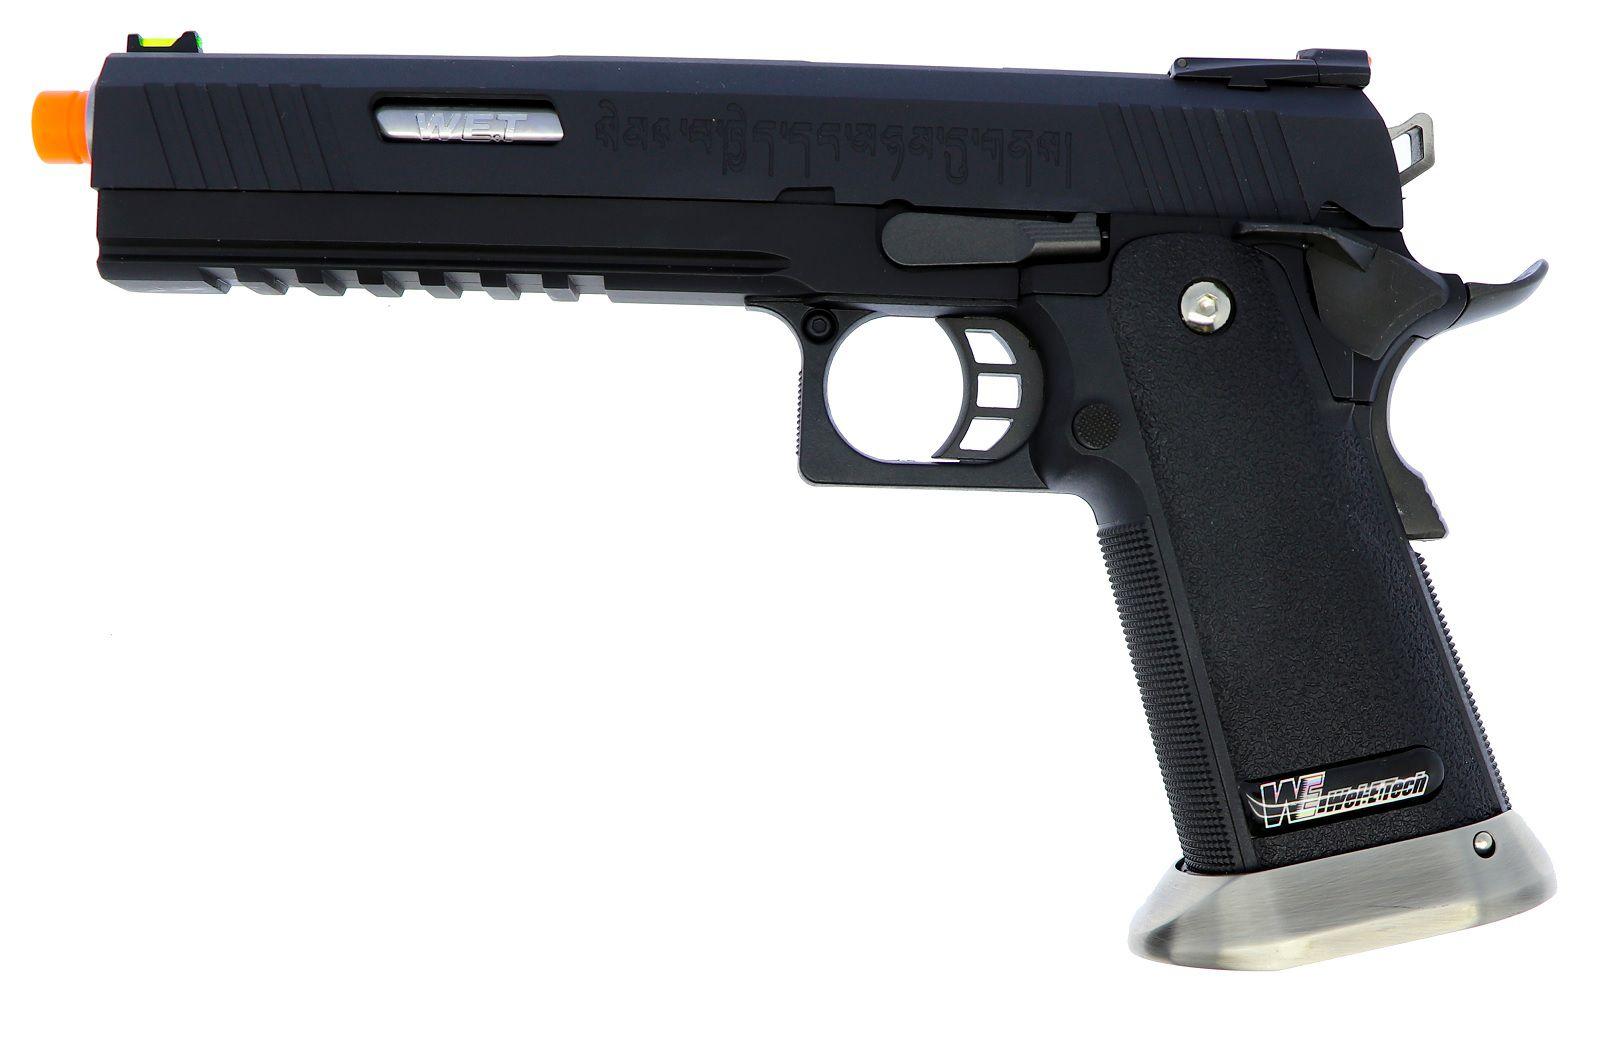 Pistola Airsoft WE Hicapa 6 Bk